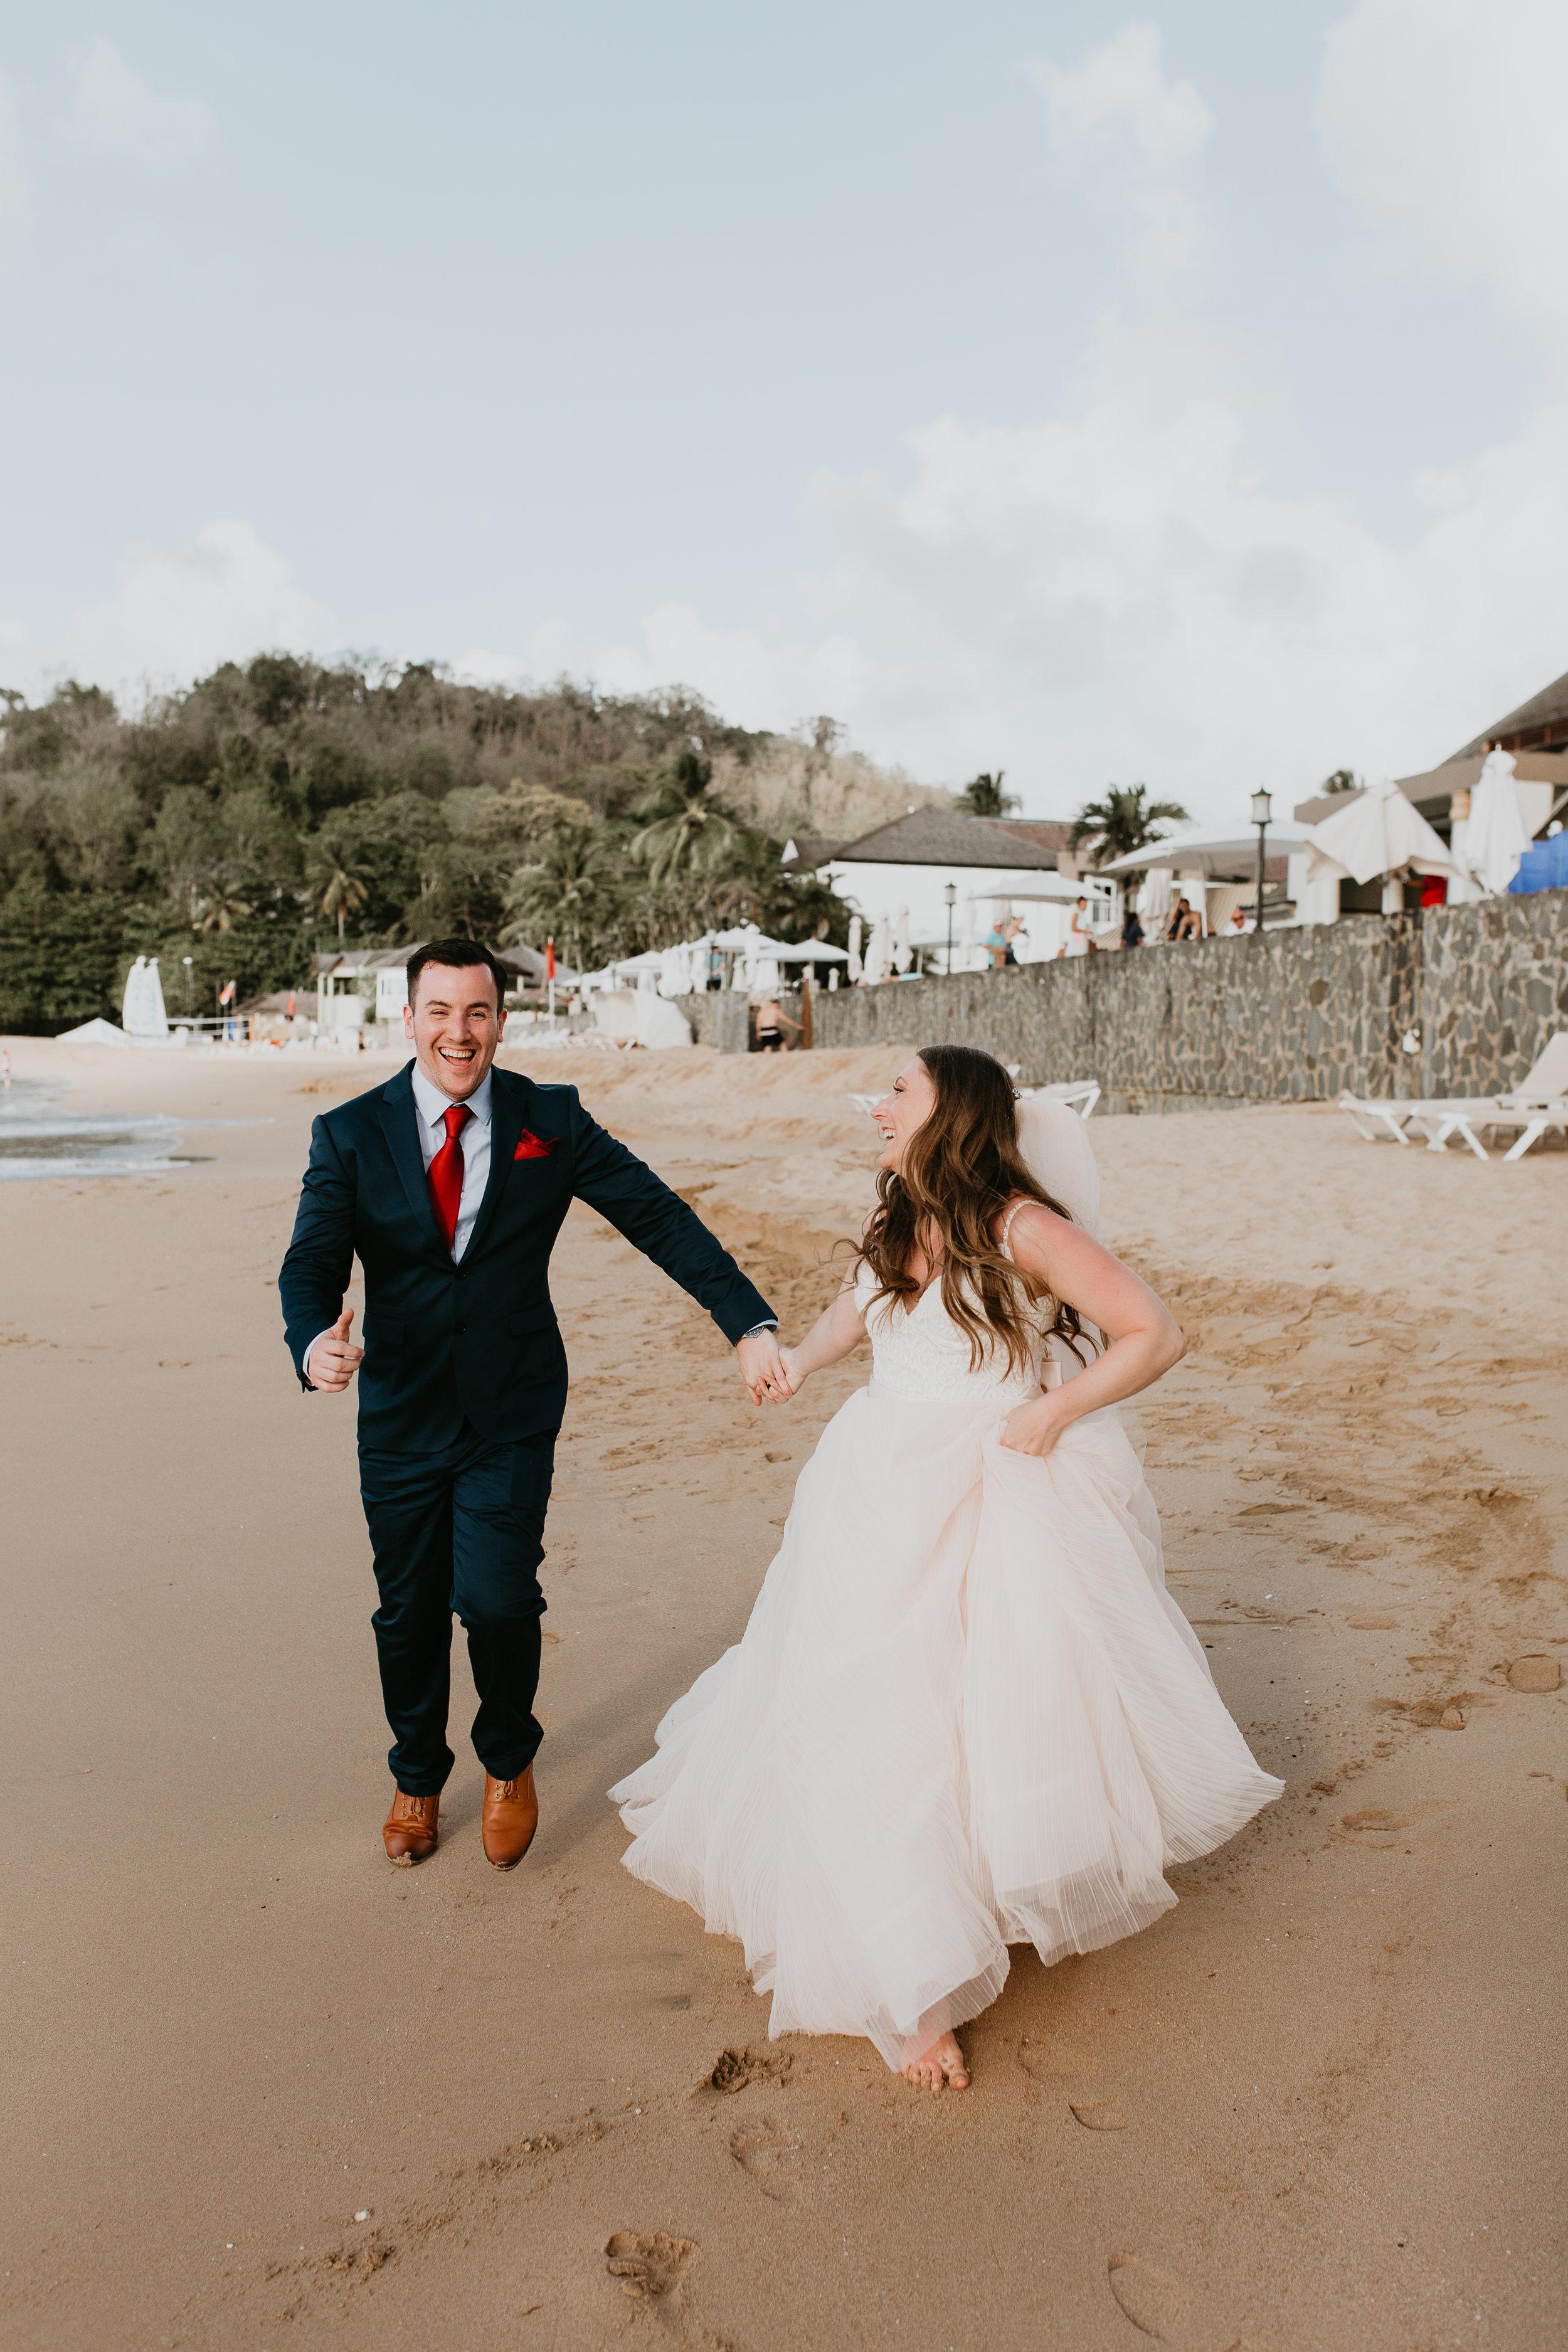 nicole-daacke-photography-destination-wedding-in-st-lucia-sandals-la-toc-intimate-island-wedding-carribean-elopement-photographer-chill-island-wedding-94.jpg